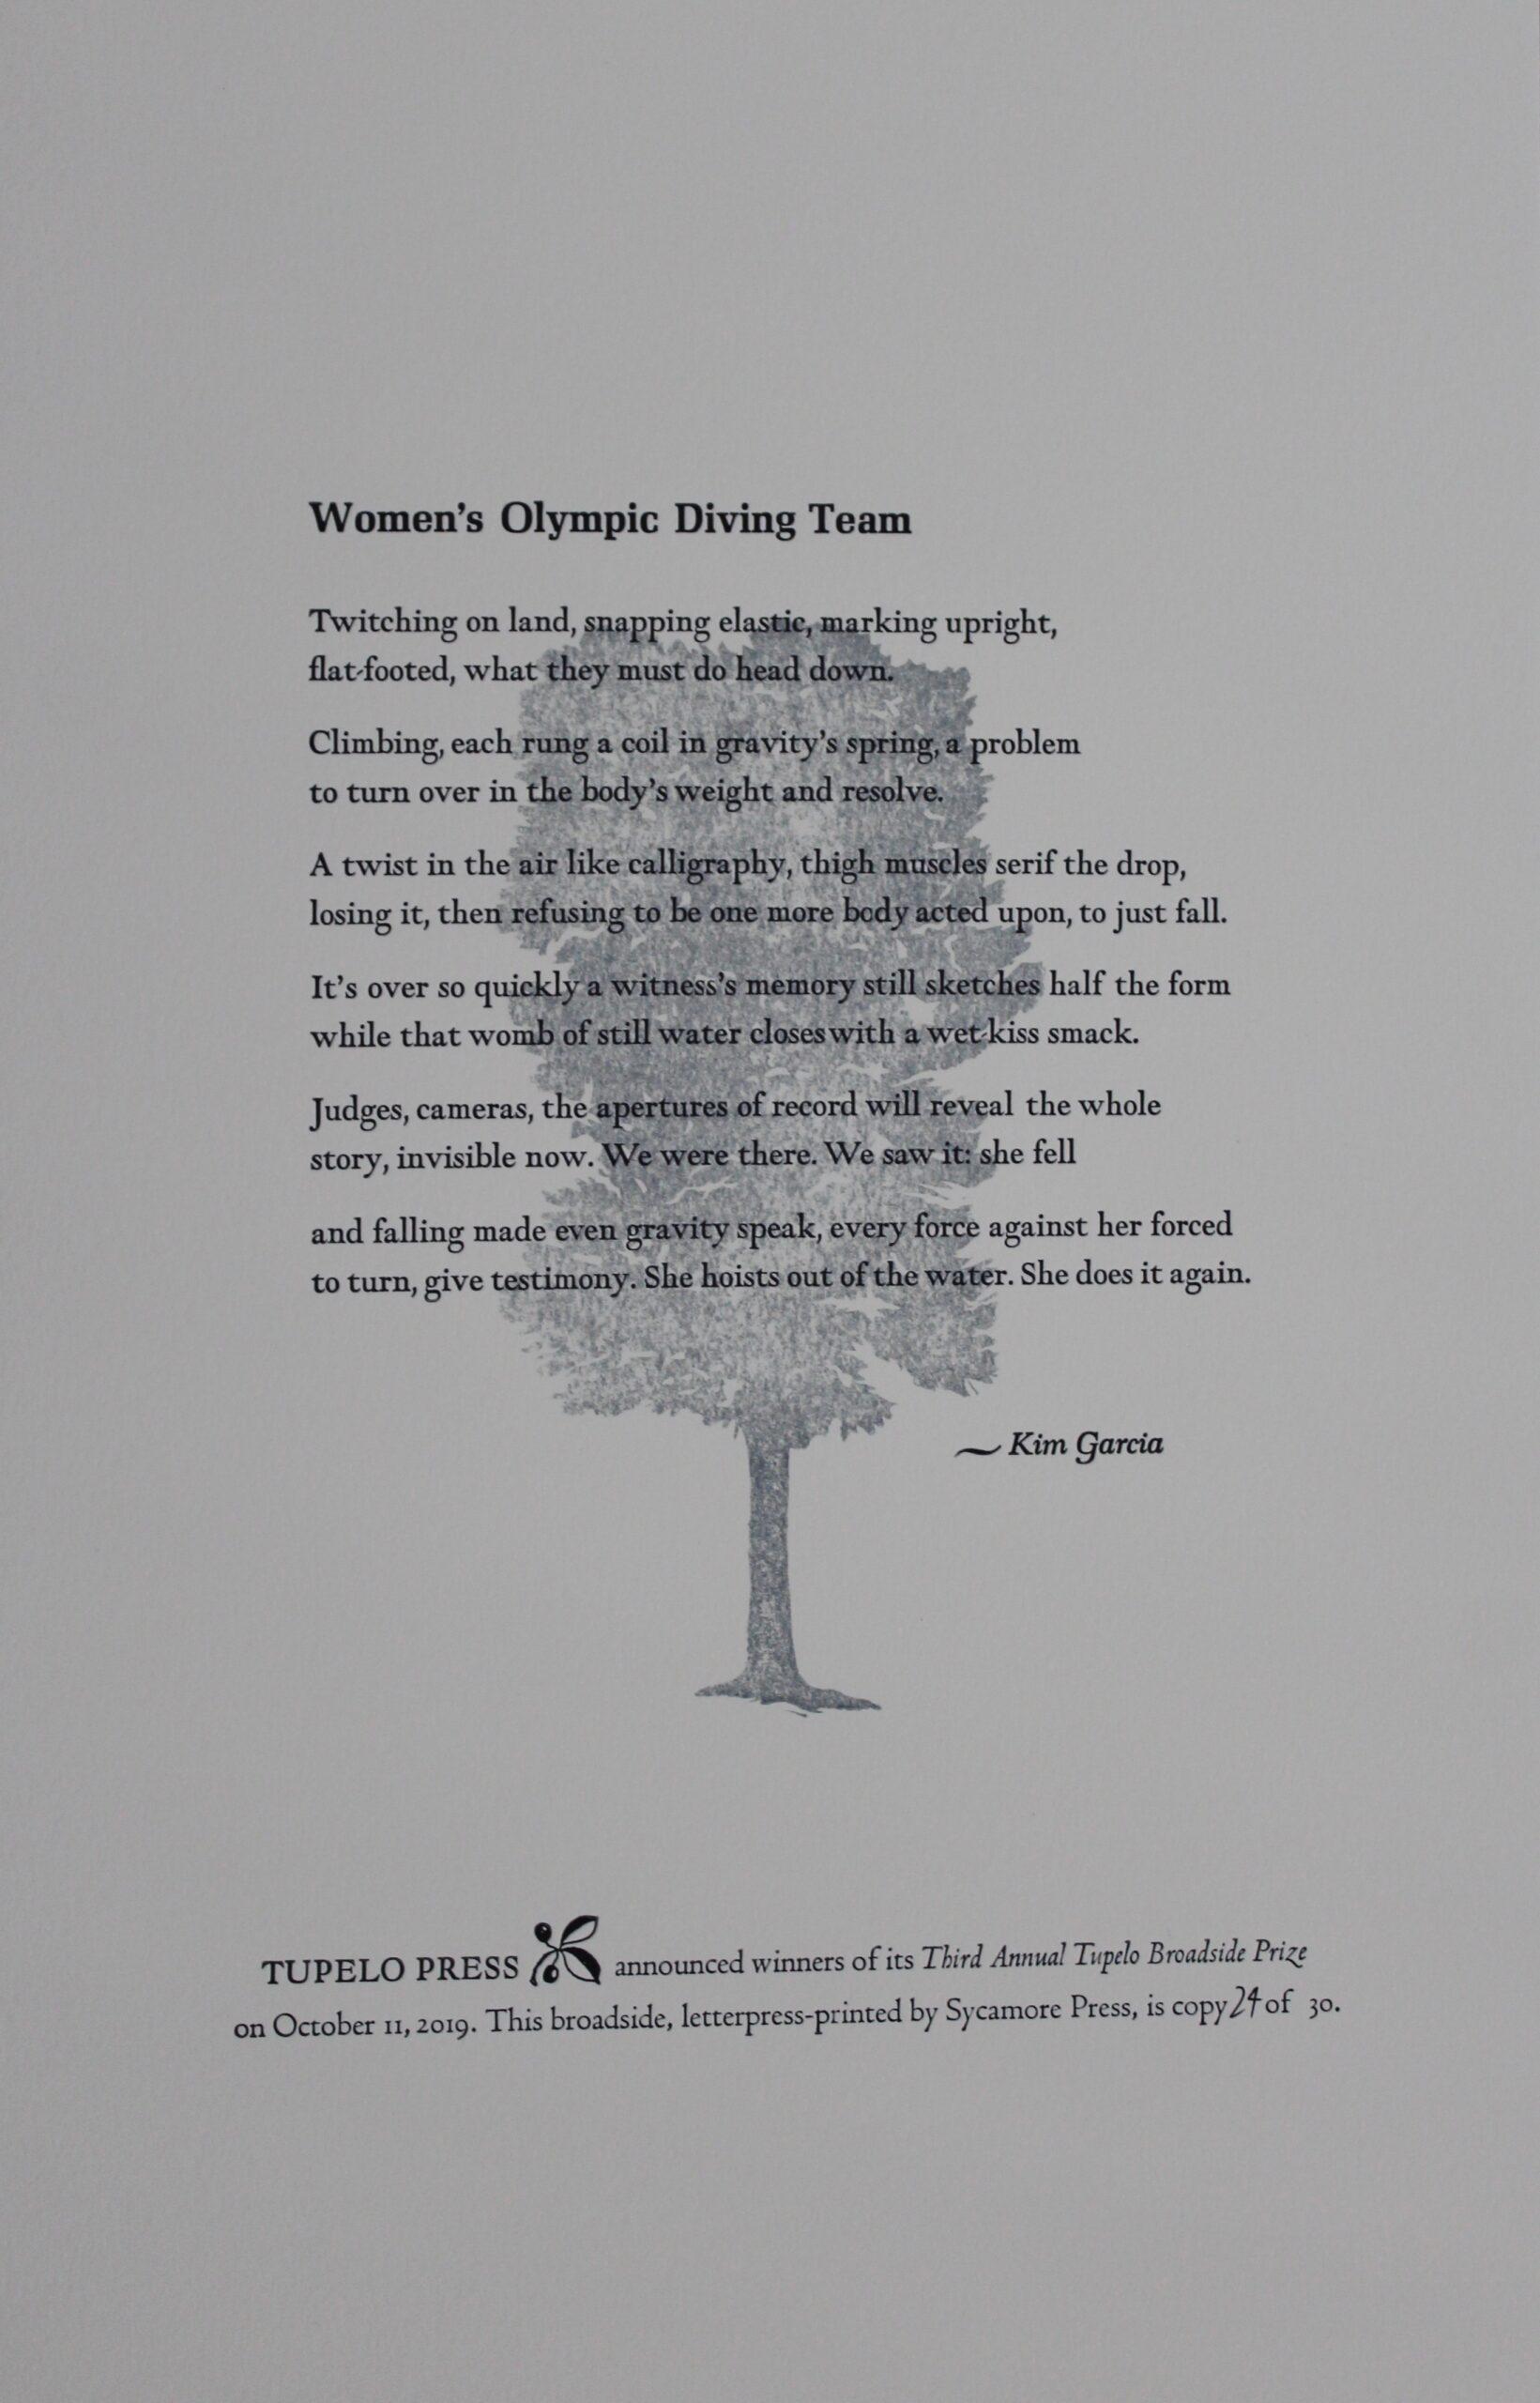 Women's Olympic Diving Team by Kim Garcia